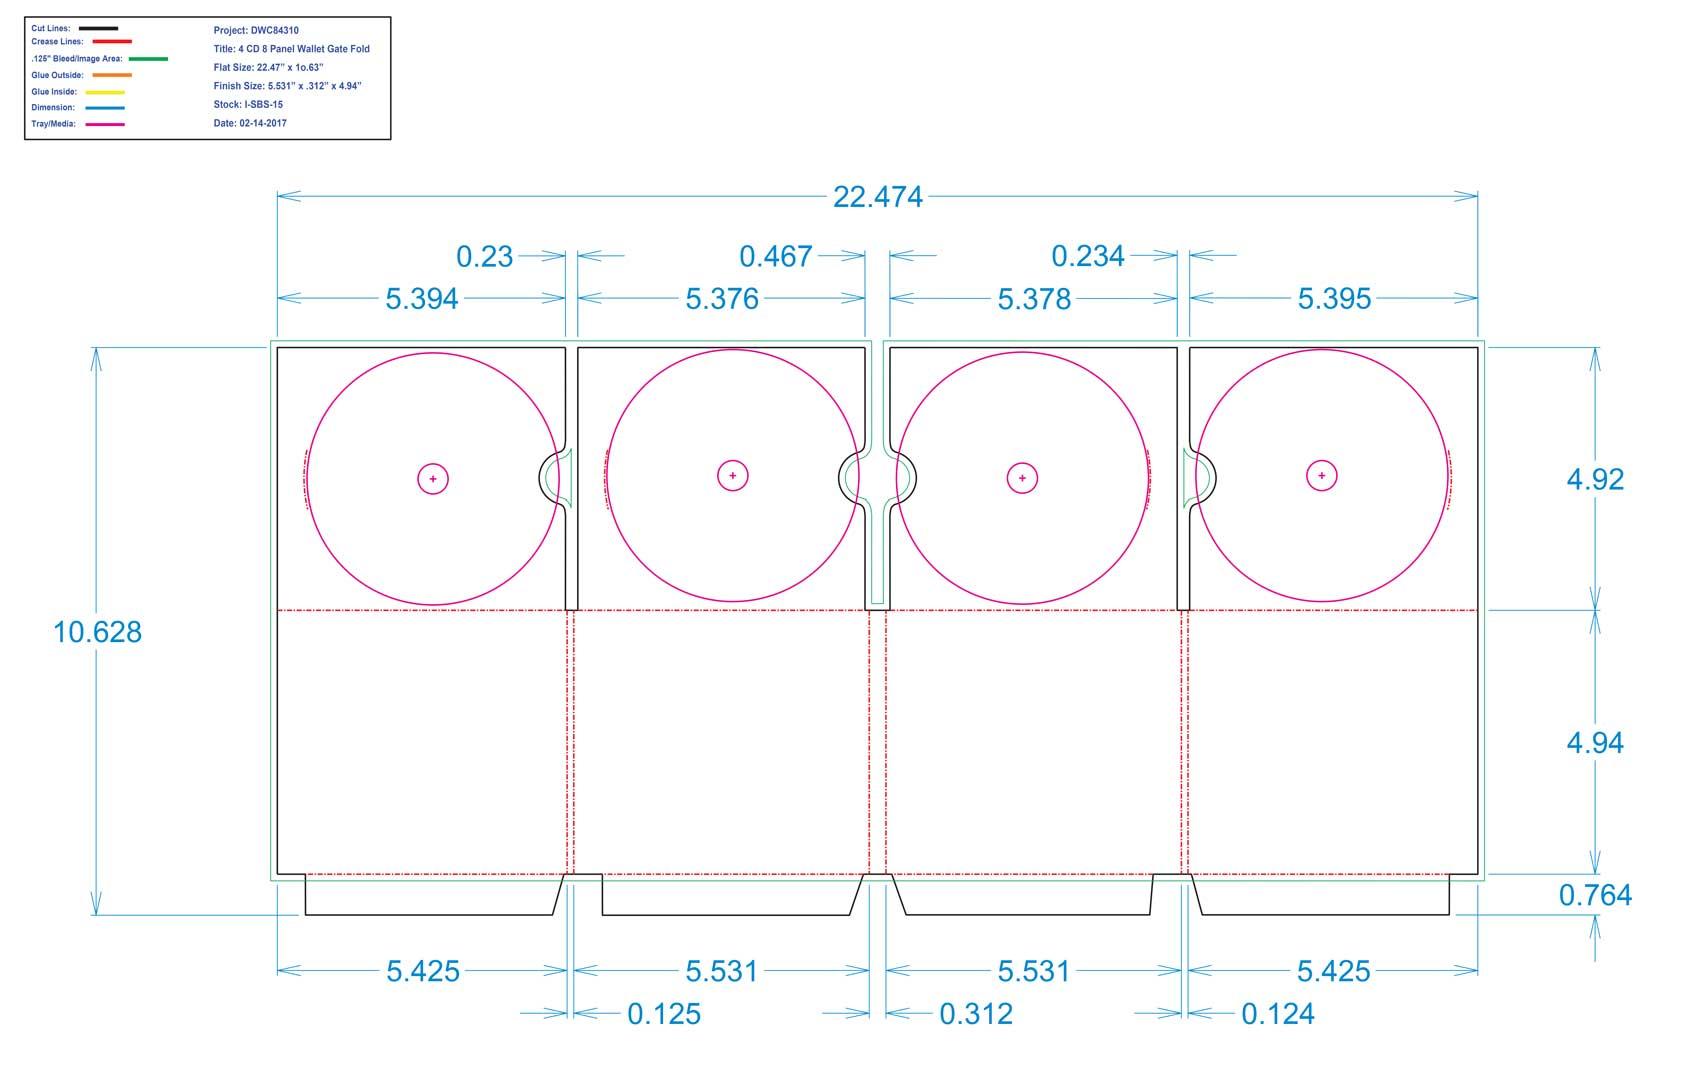 DWC84310-4 CD 8 Panel Wallet Gate Fold